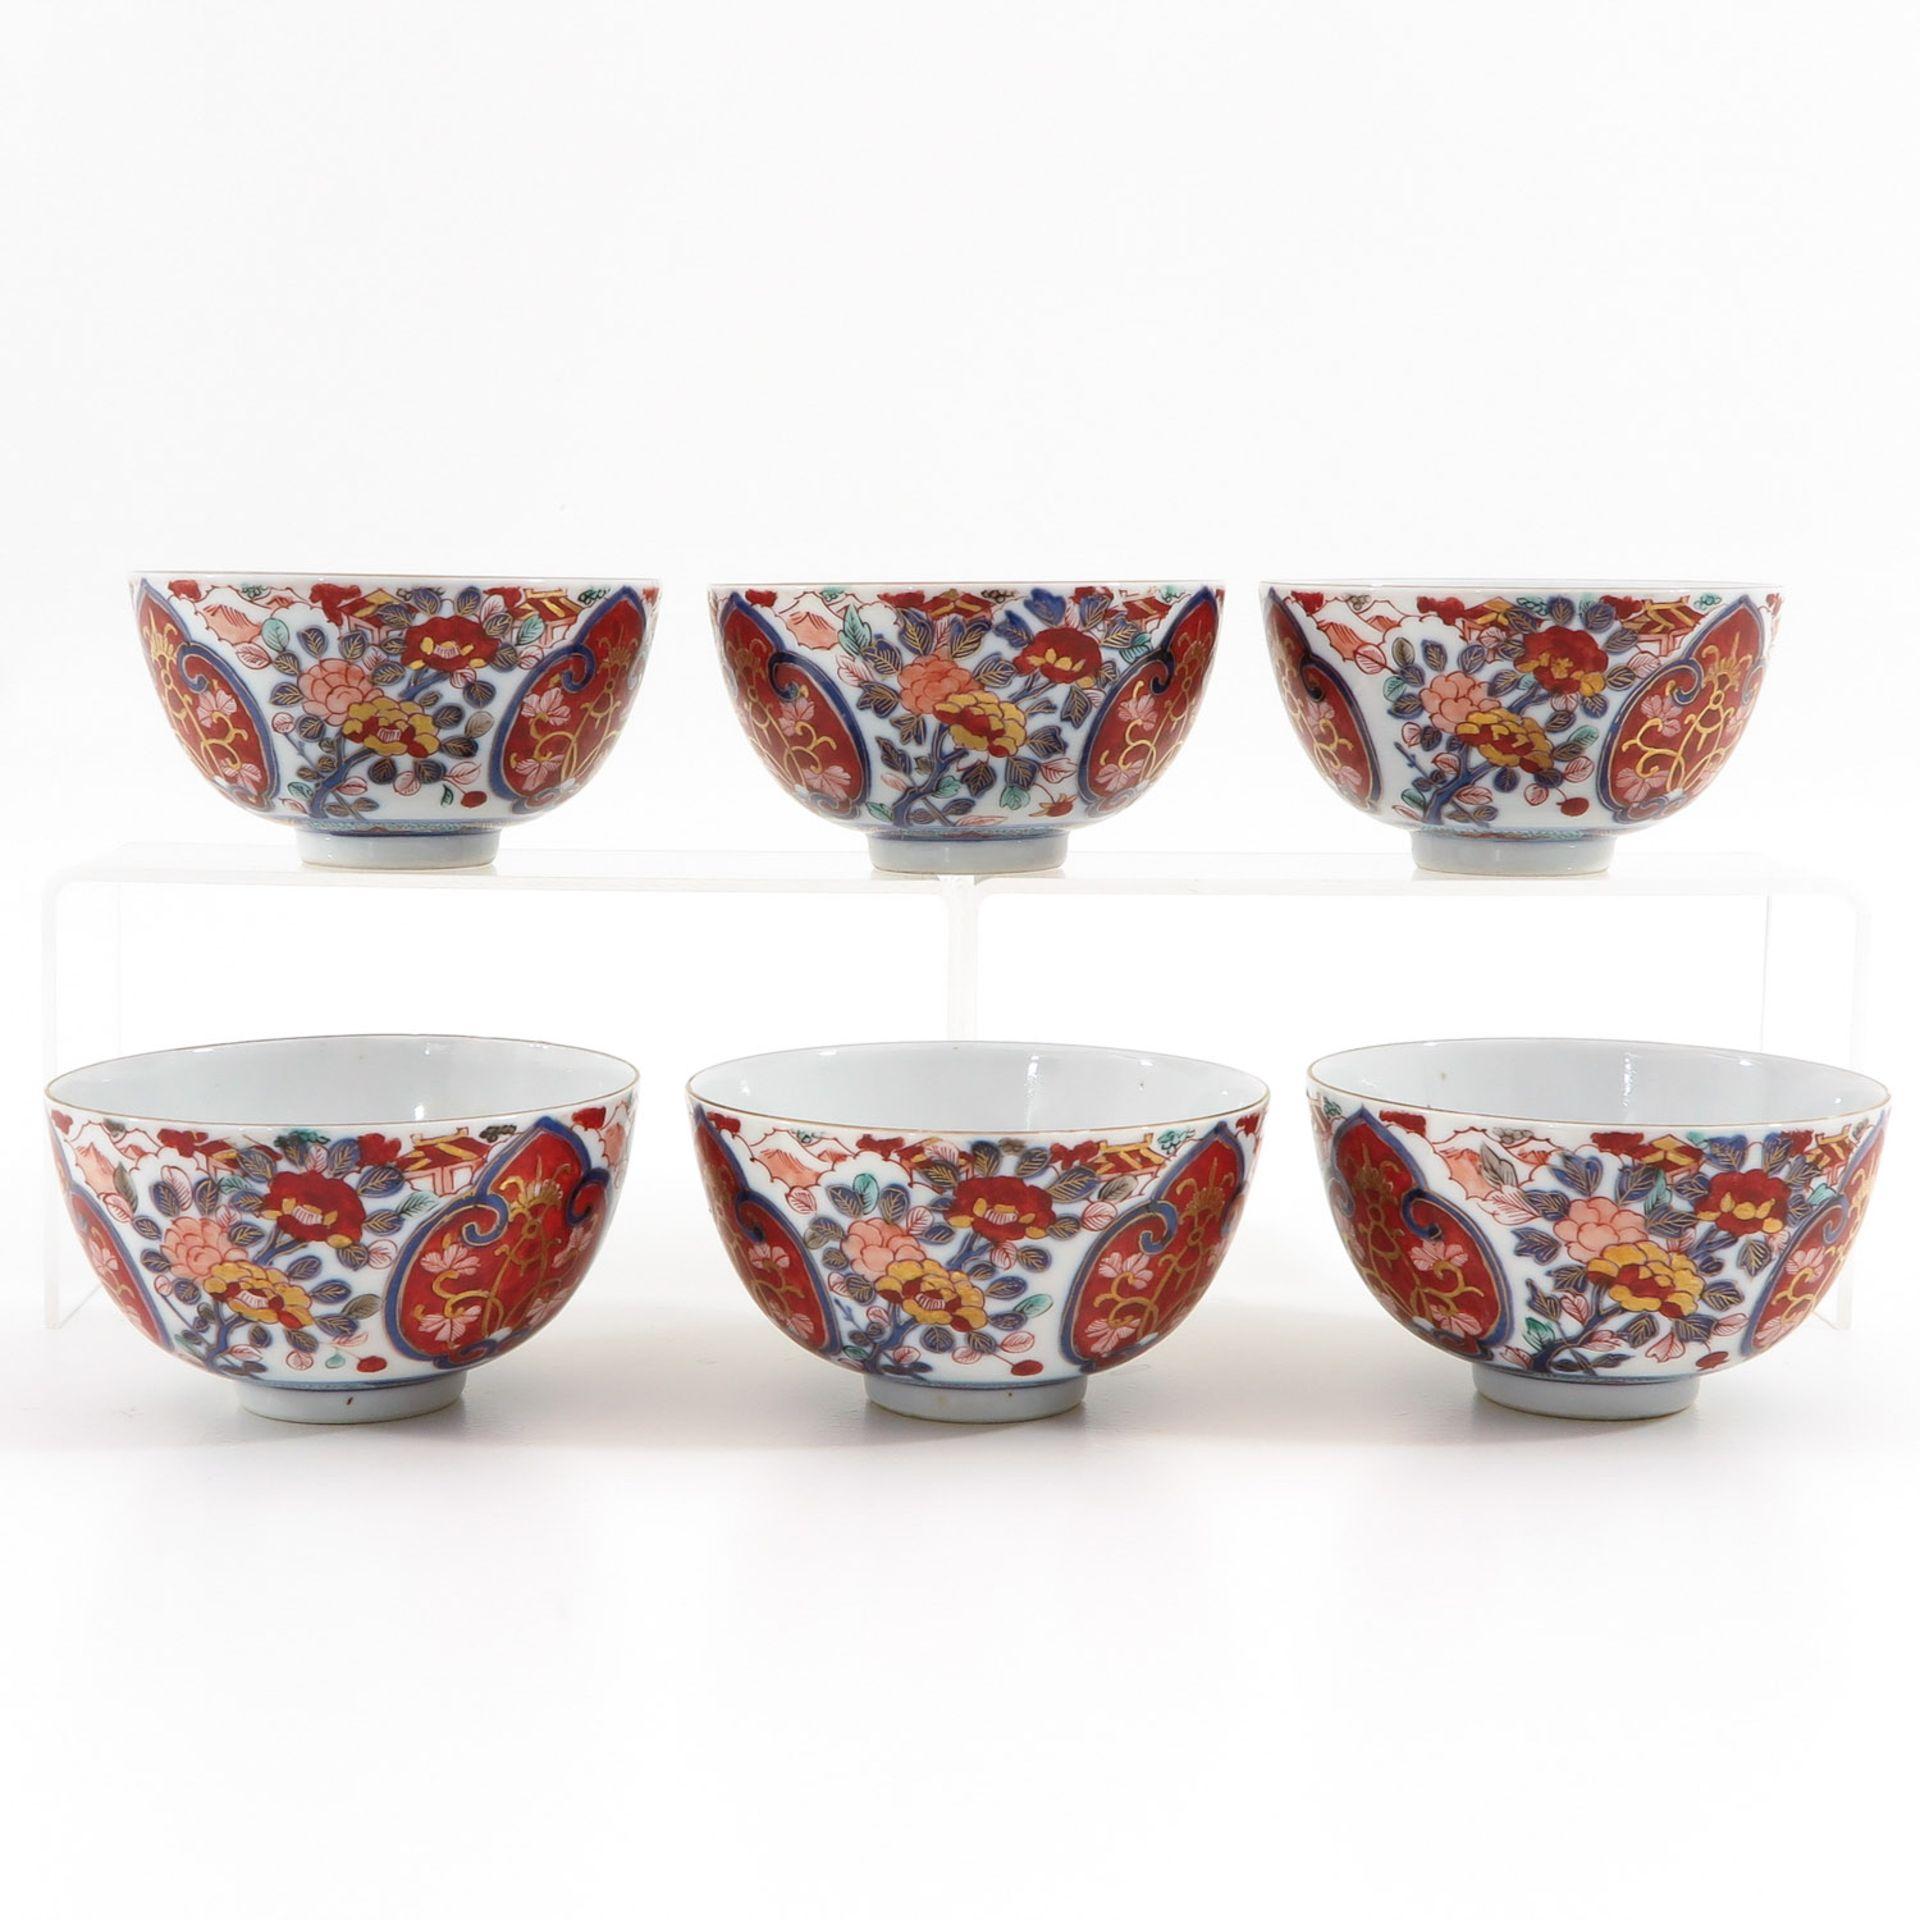 Los 7057 - A Series of 6 Imari Bowls